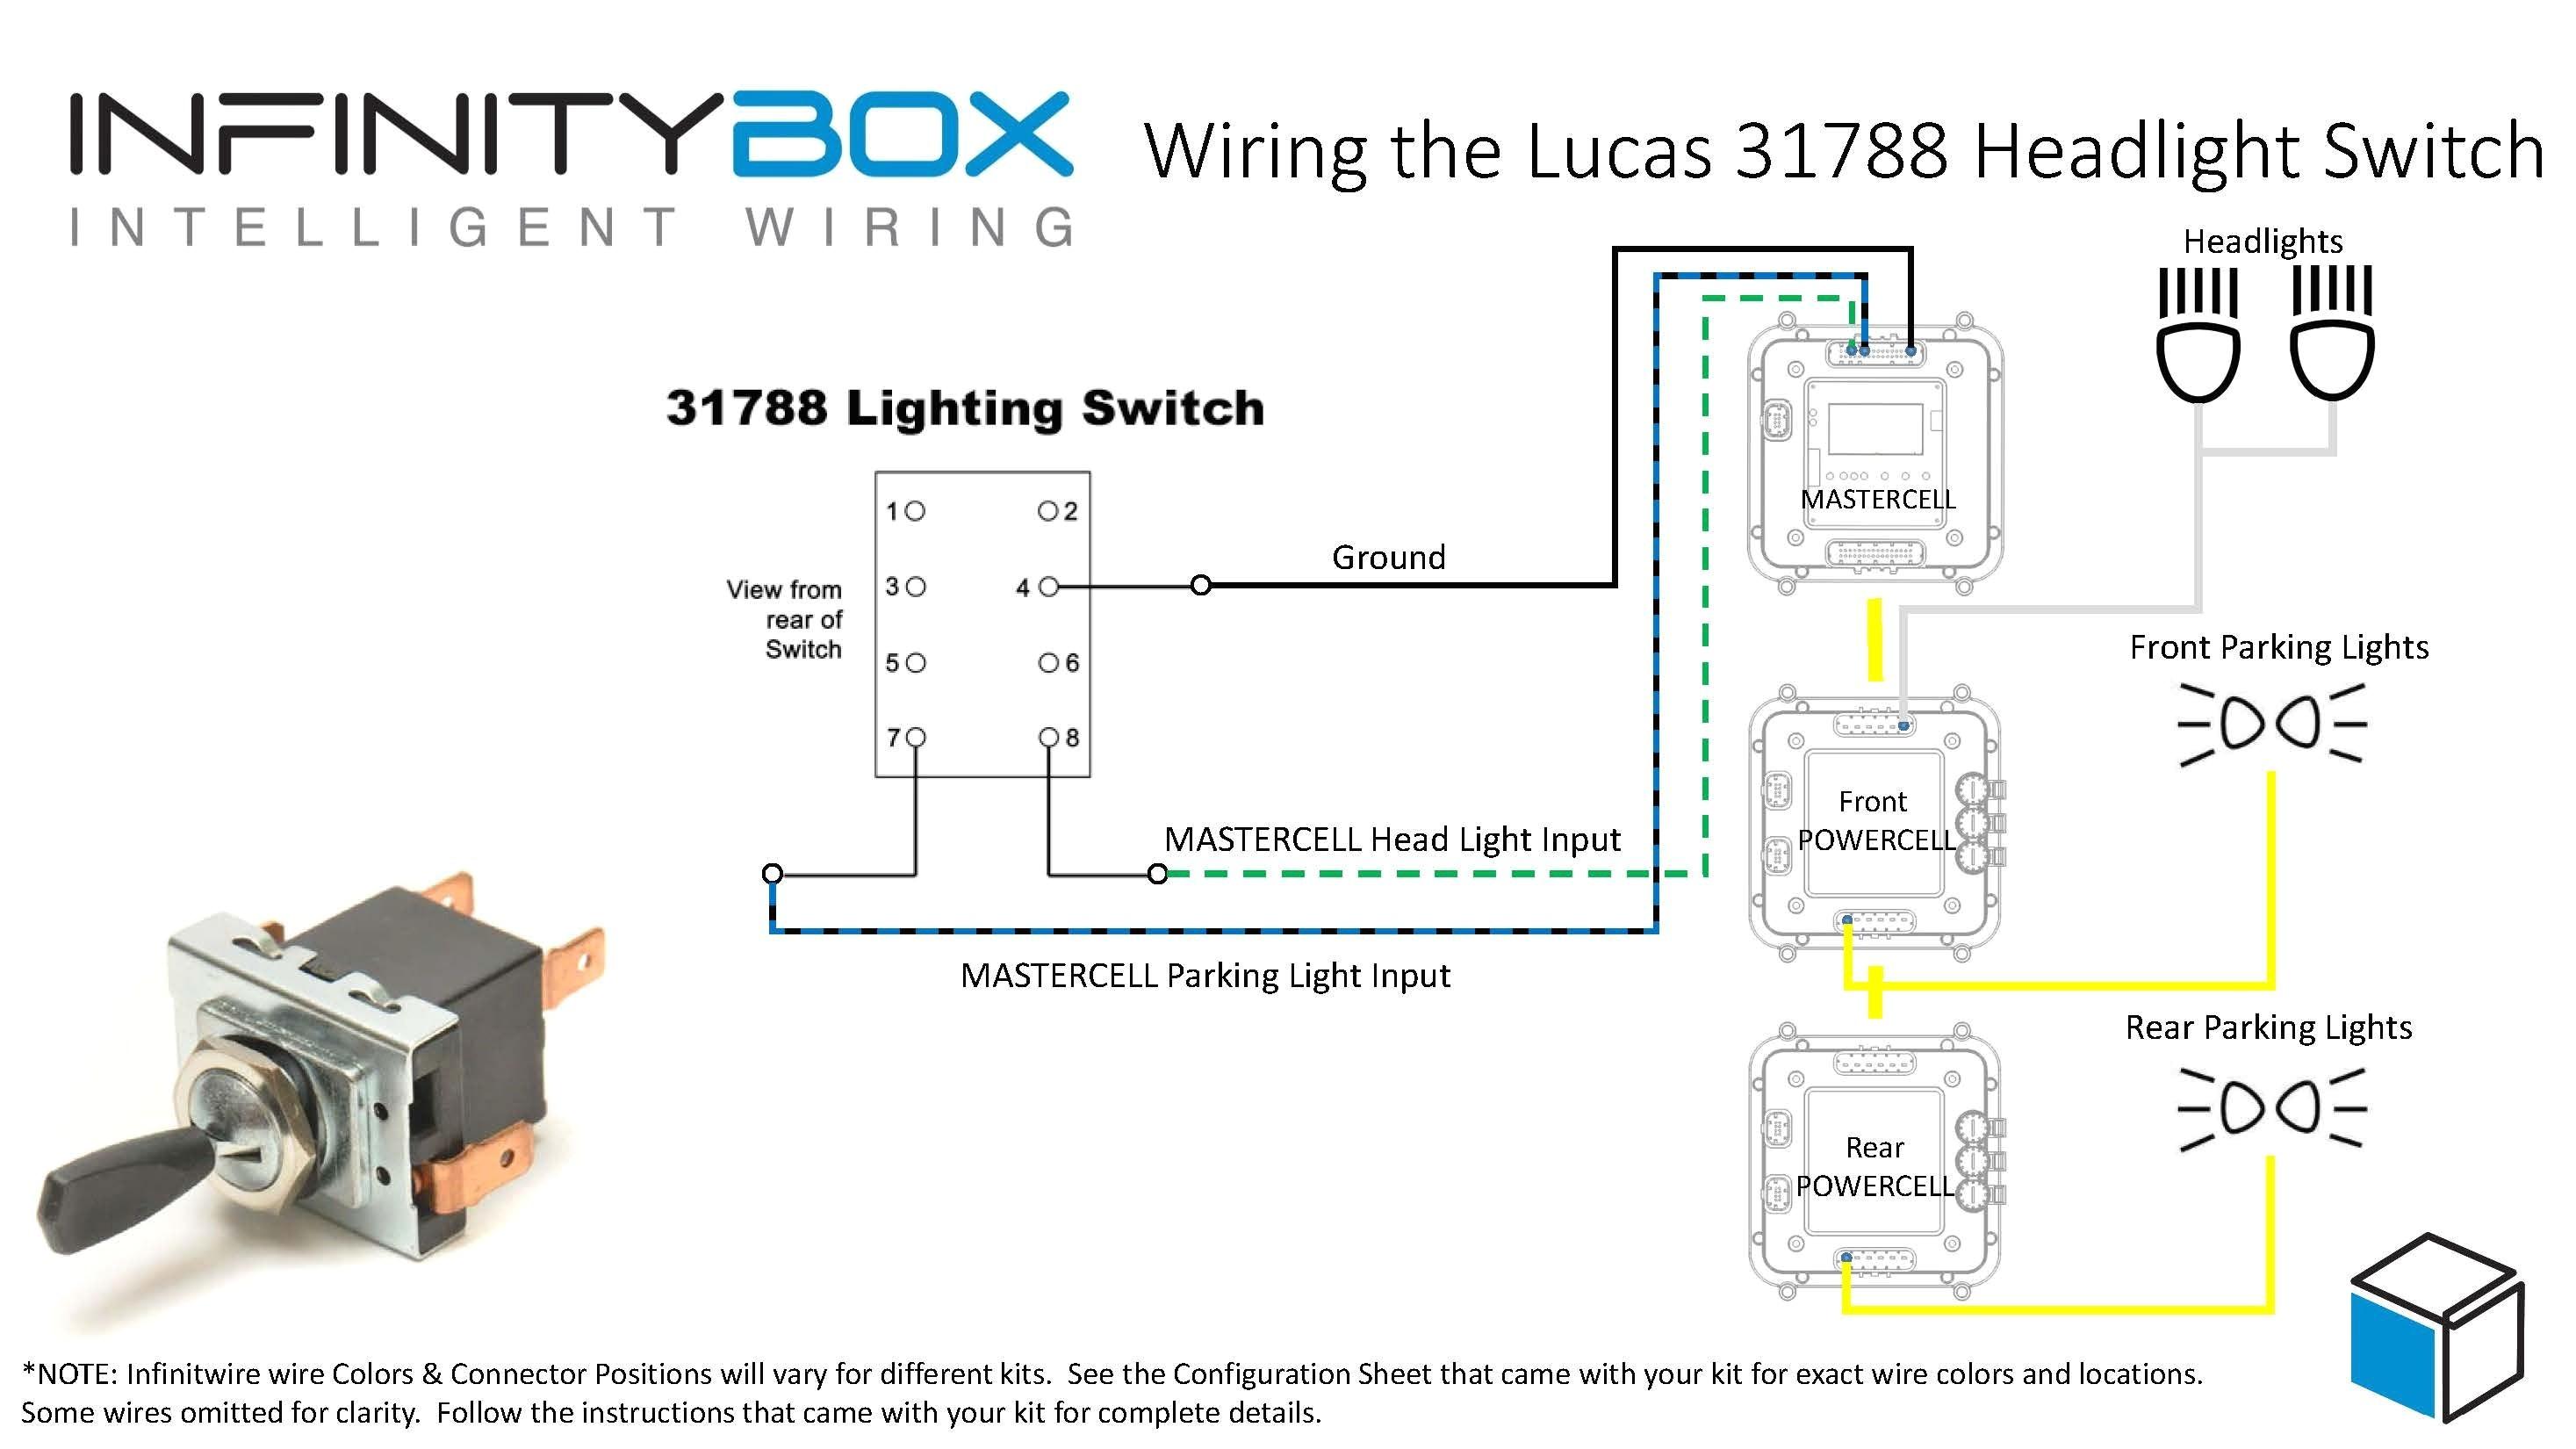 Headlight Switch Wiring Diagram Headlight Switch Wiring Diagram Coachedby Of Headlight Switch Wiring Diagram